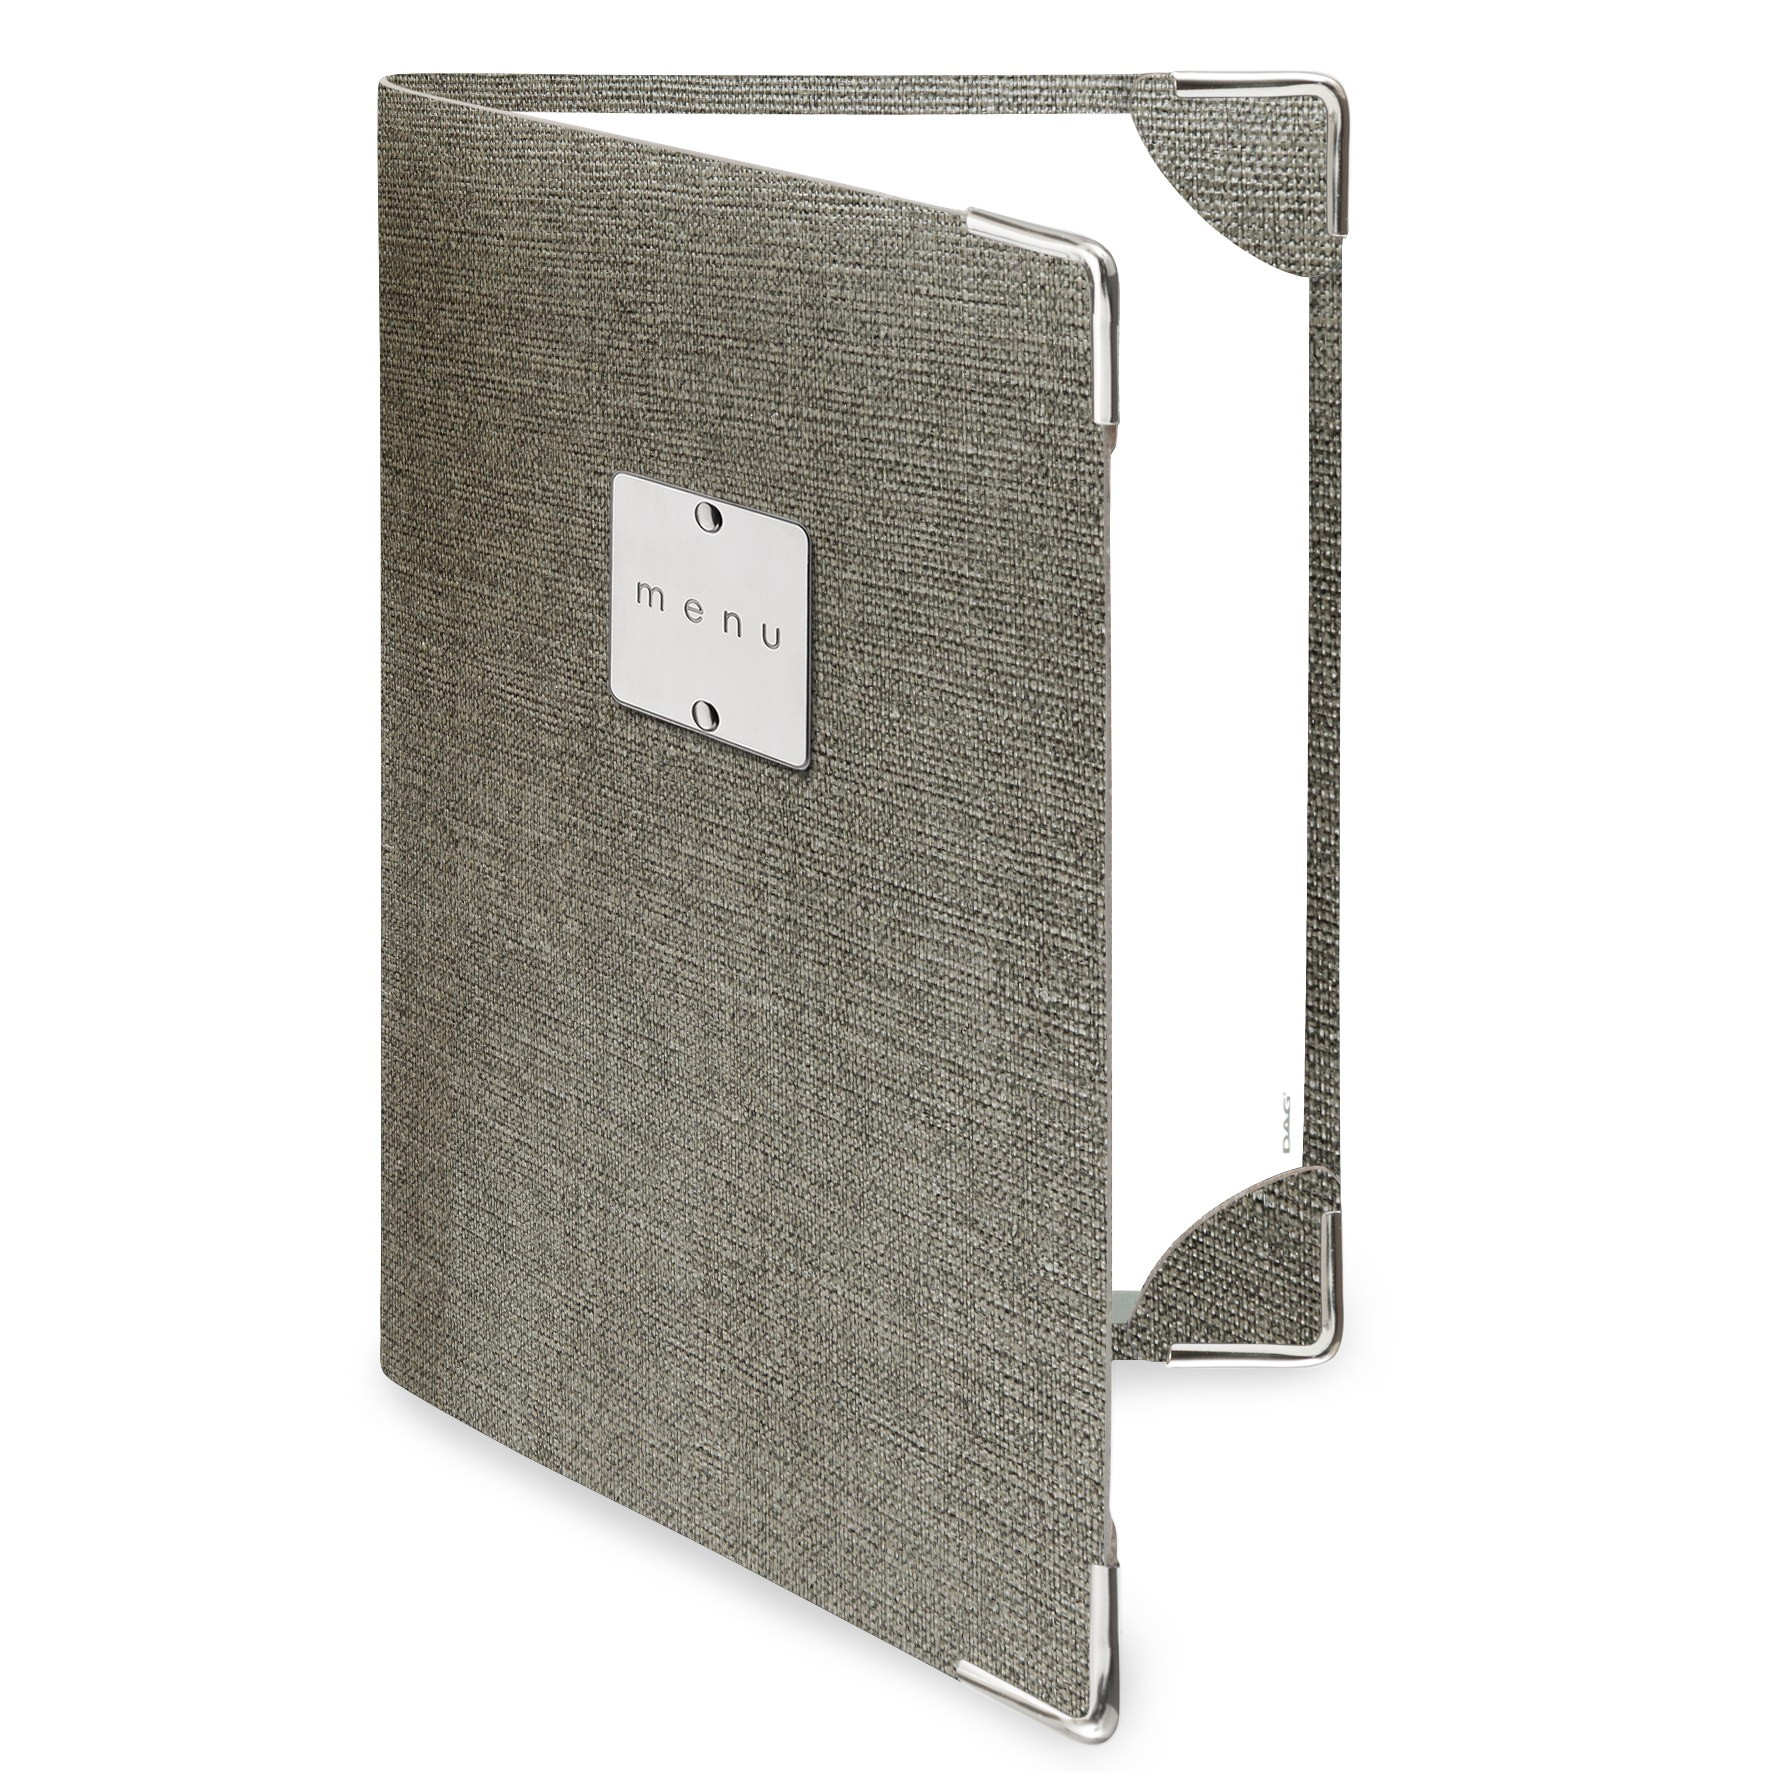 Protège menu 2 volets MenuMenu gris aspect jute